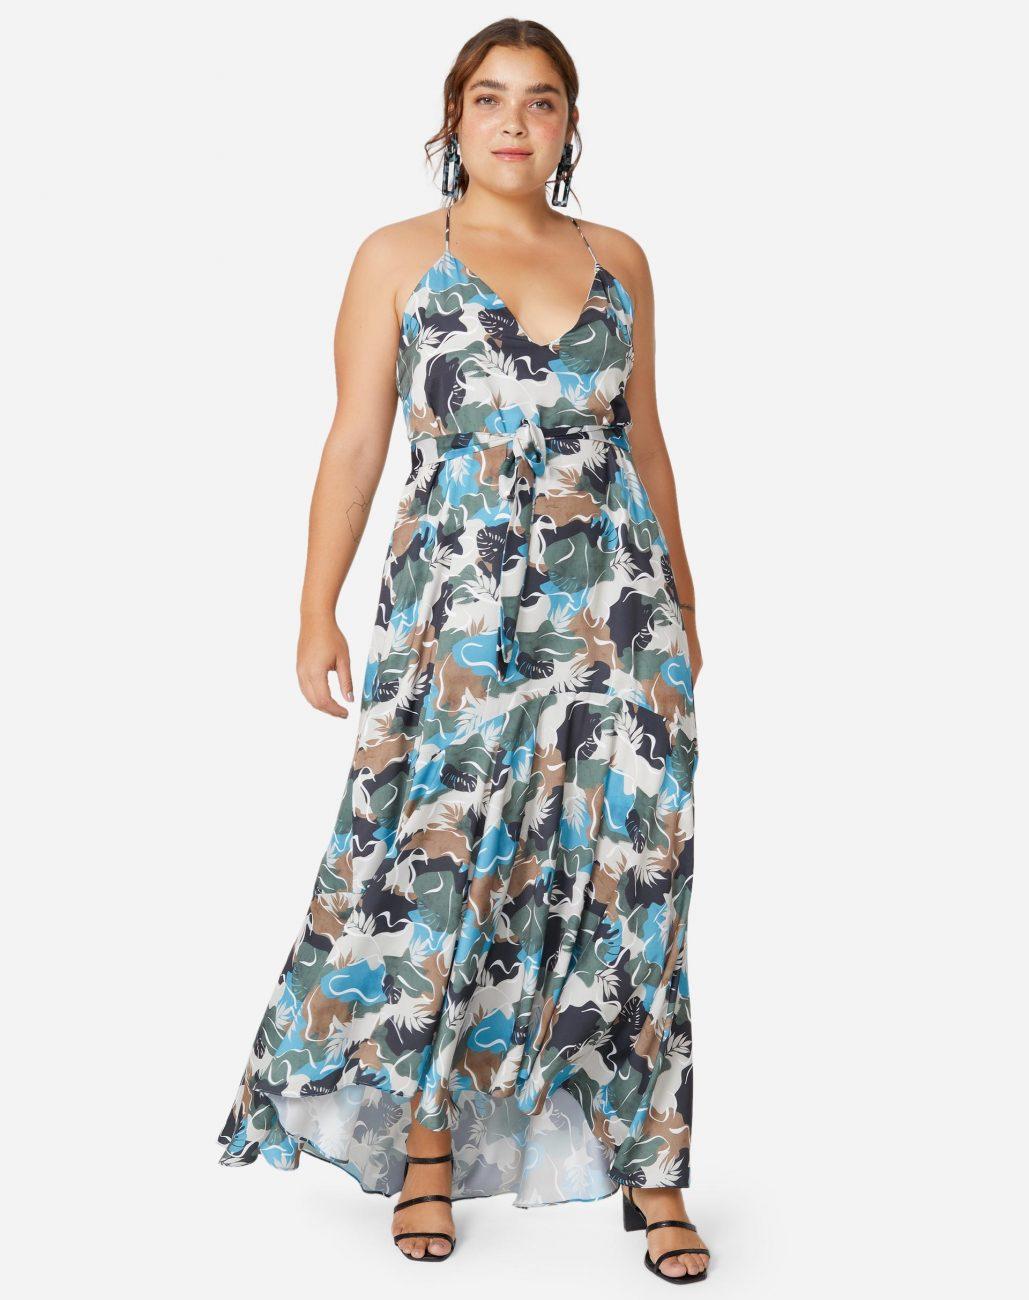 vestido para convidadas para casamento de dia